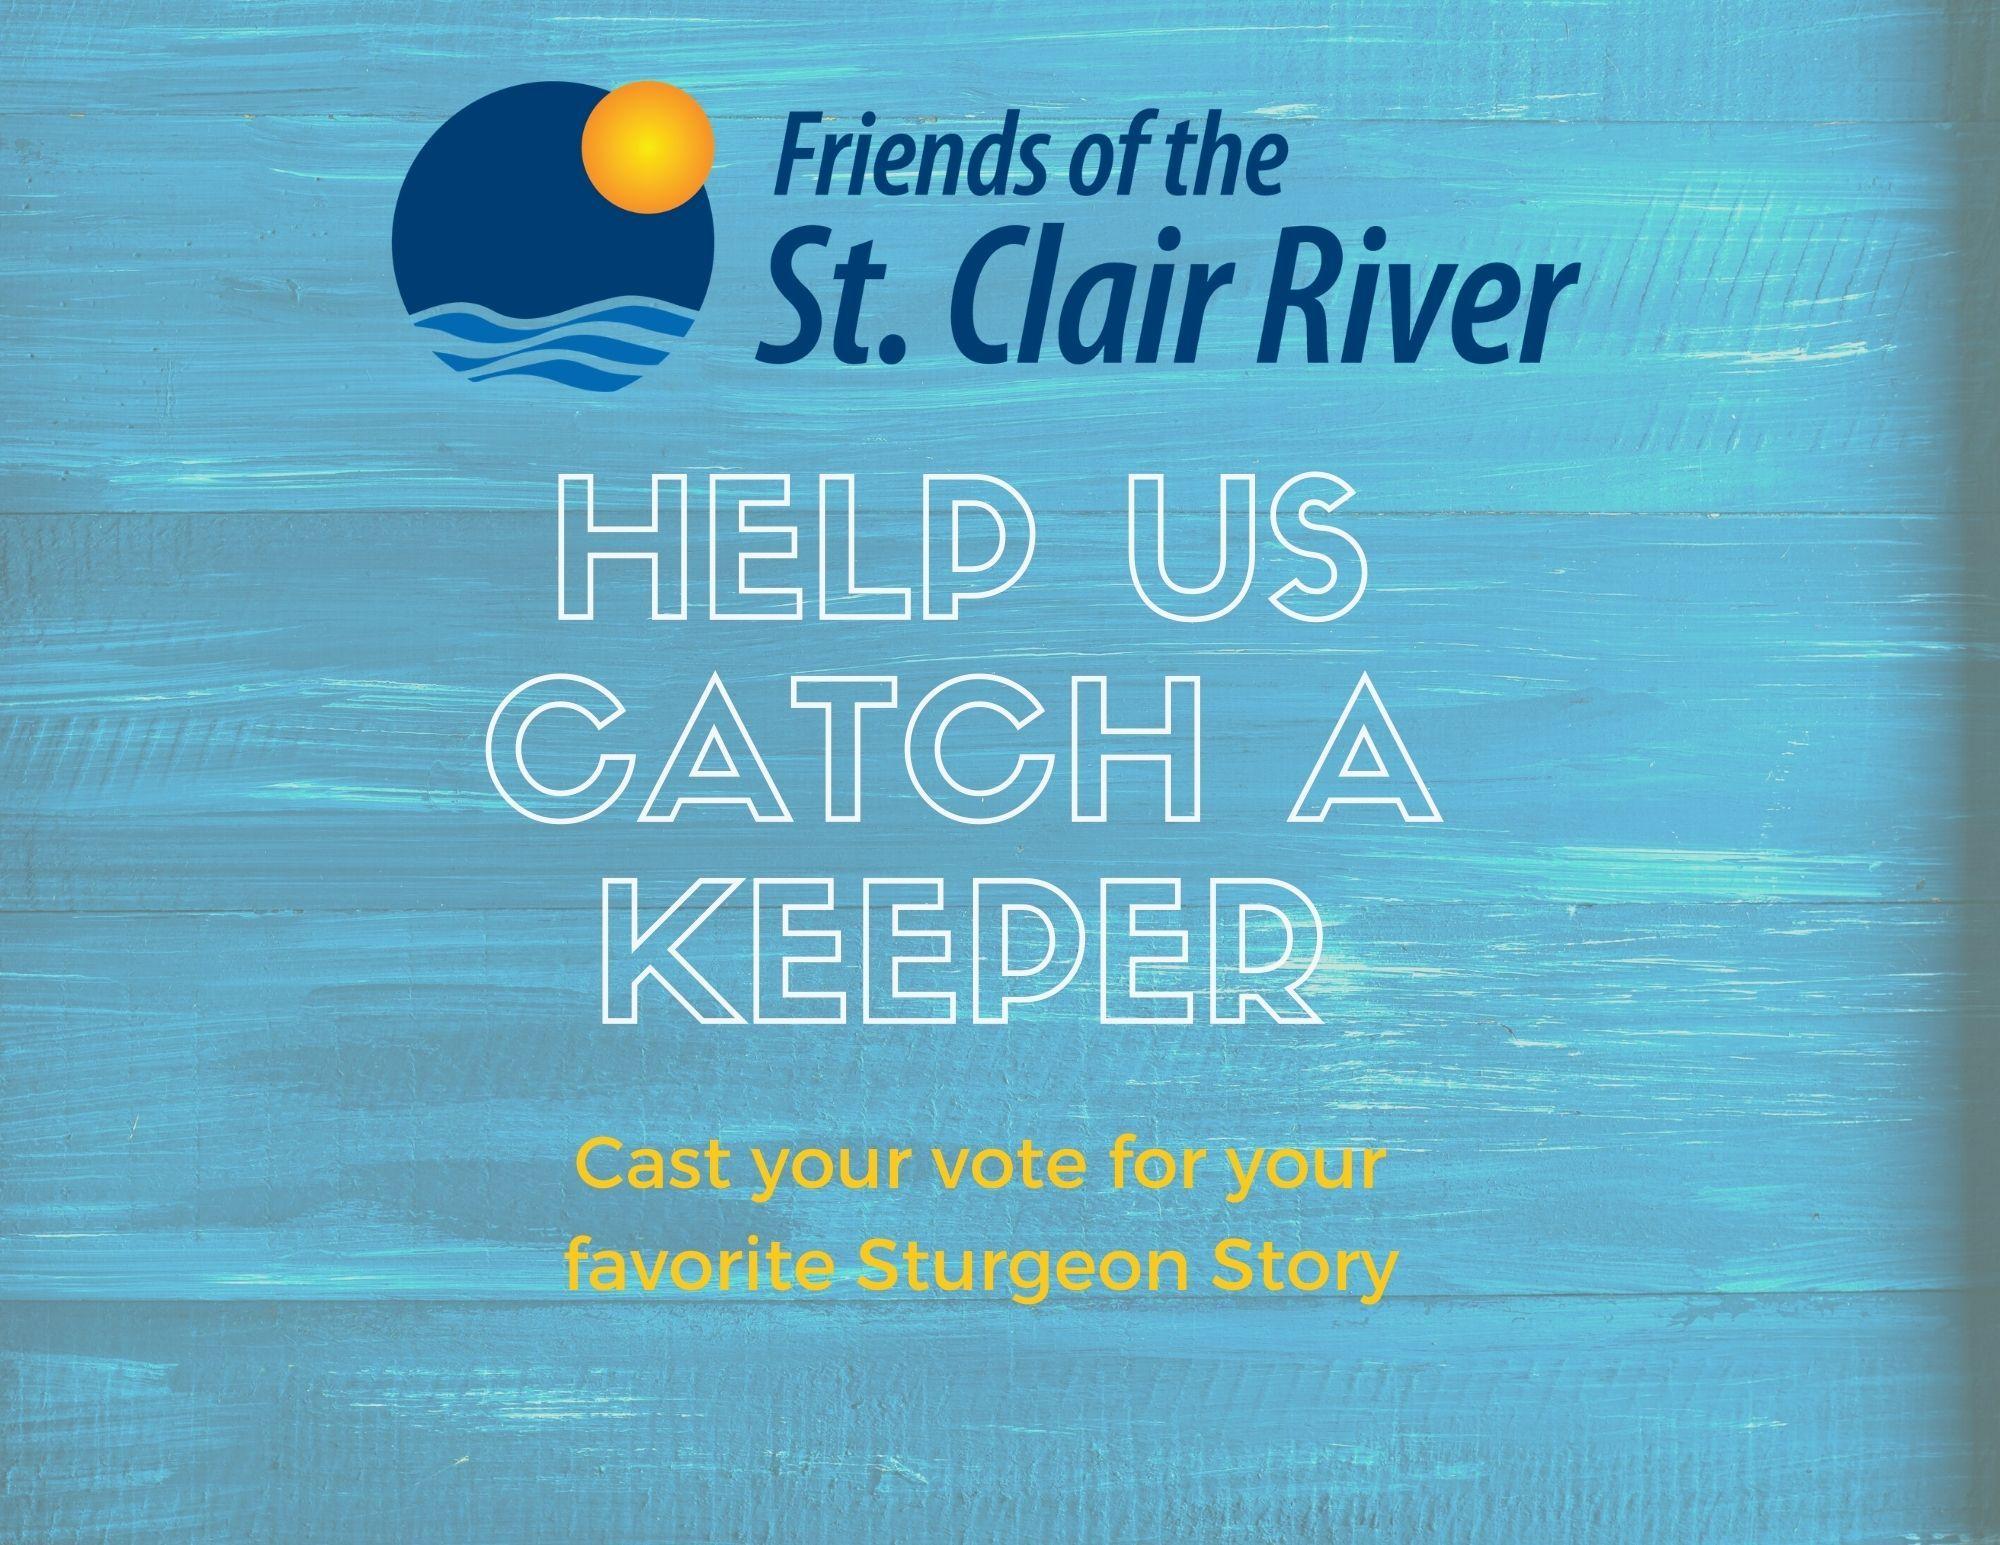 Help us catch a keeper